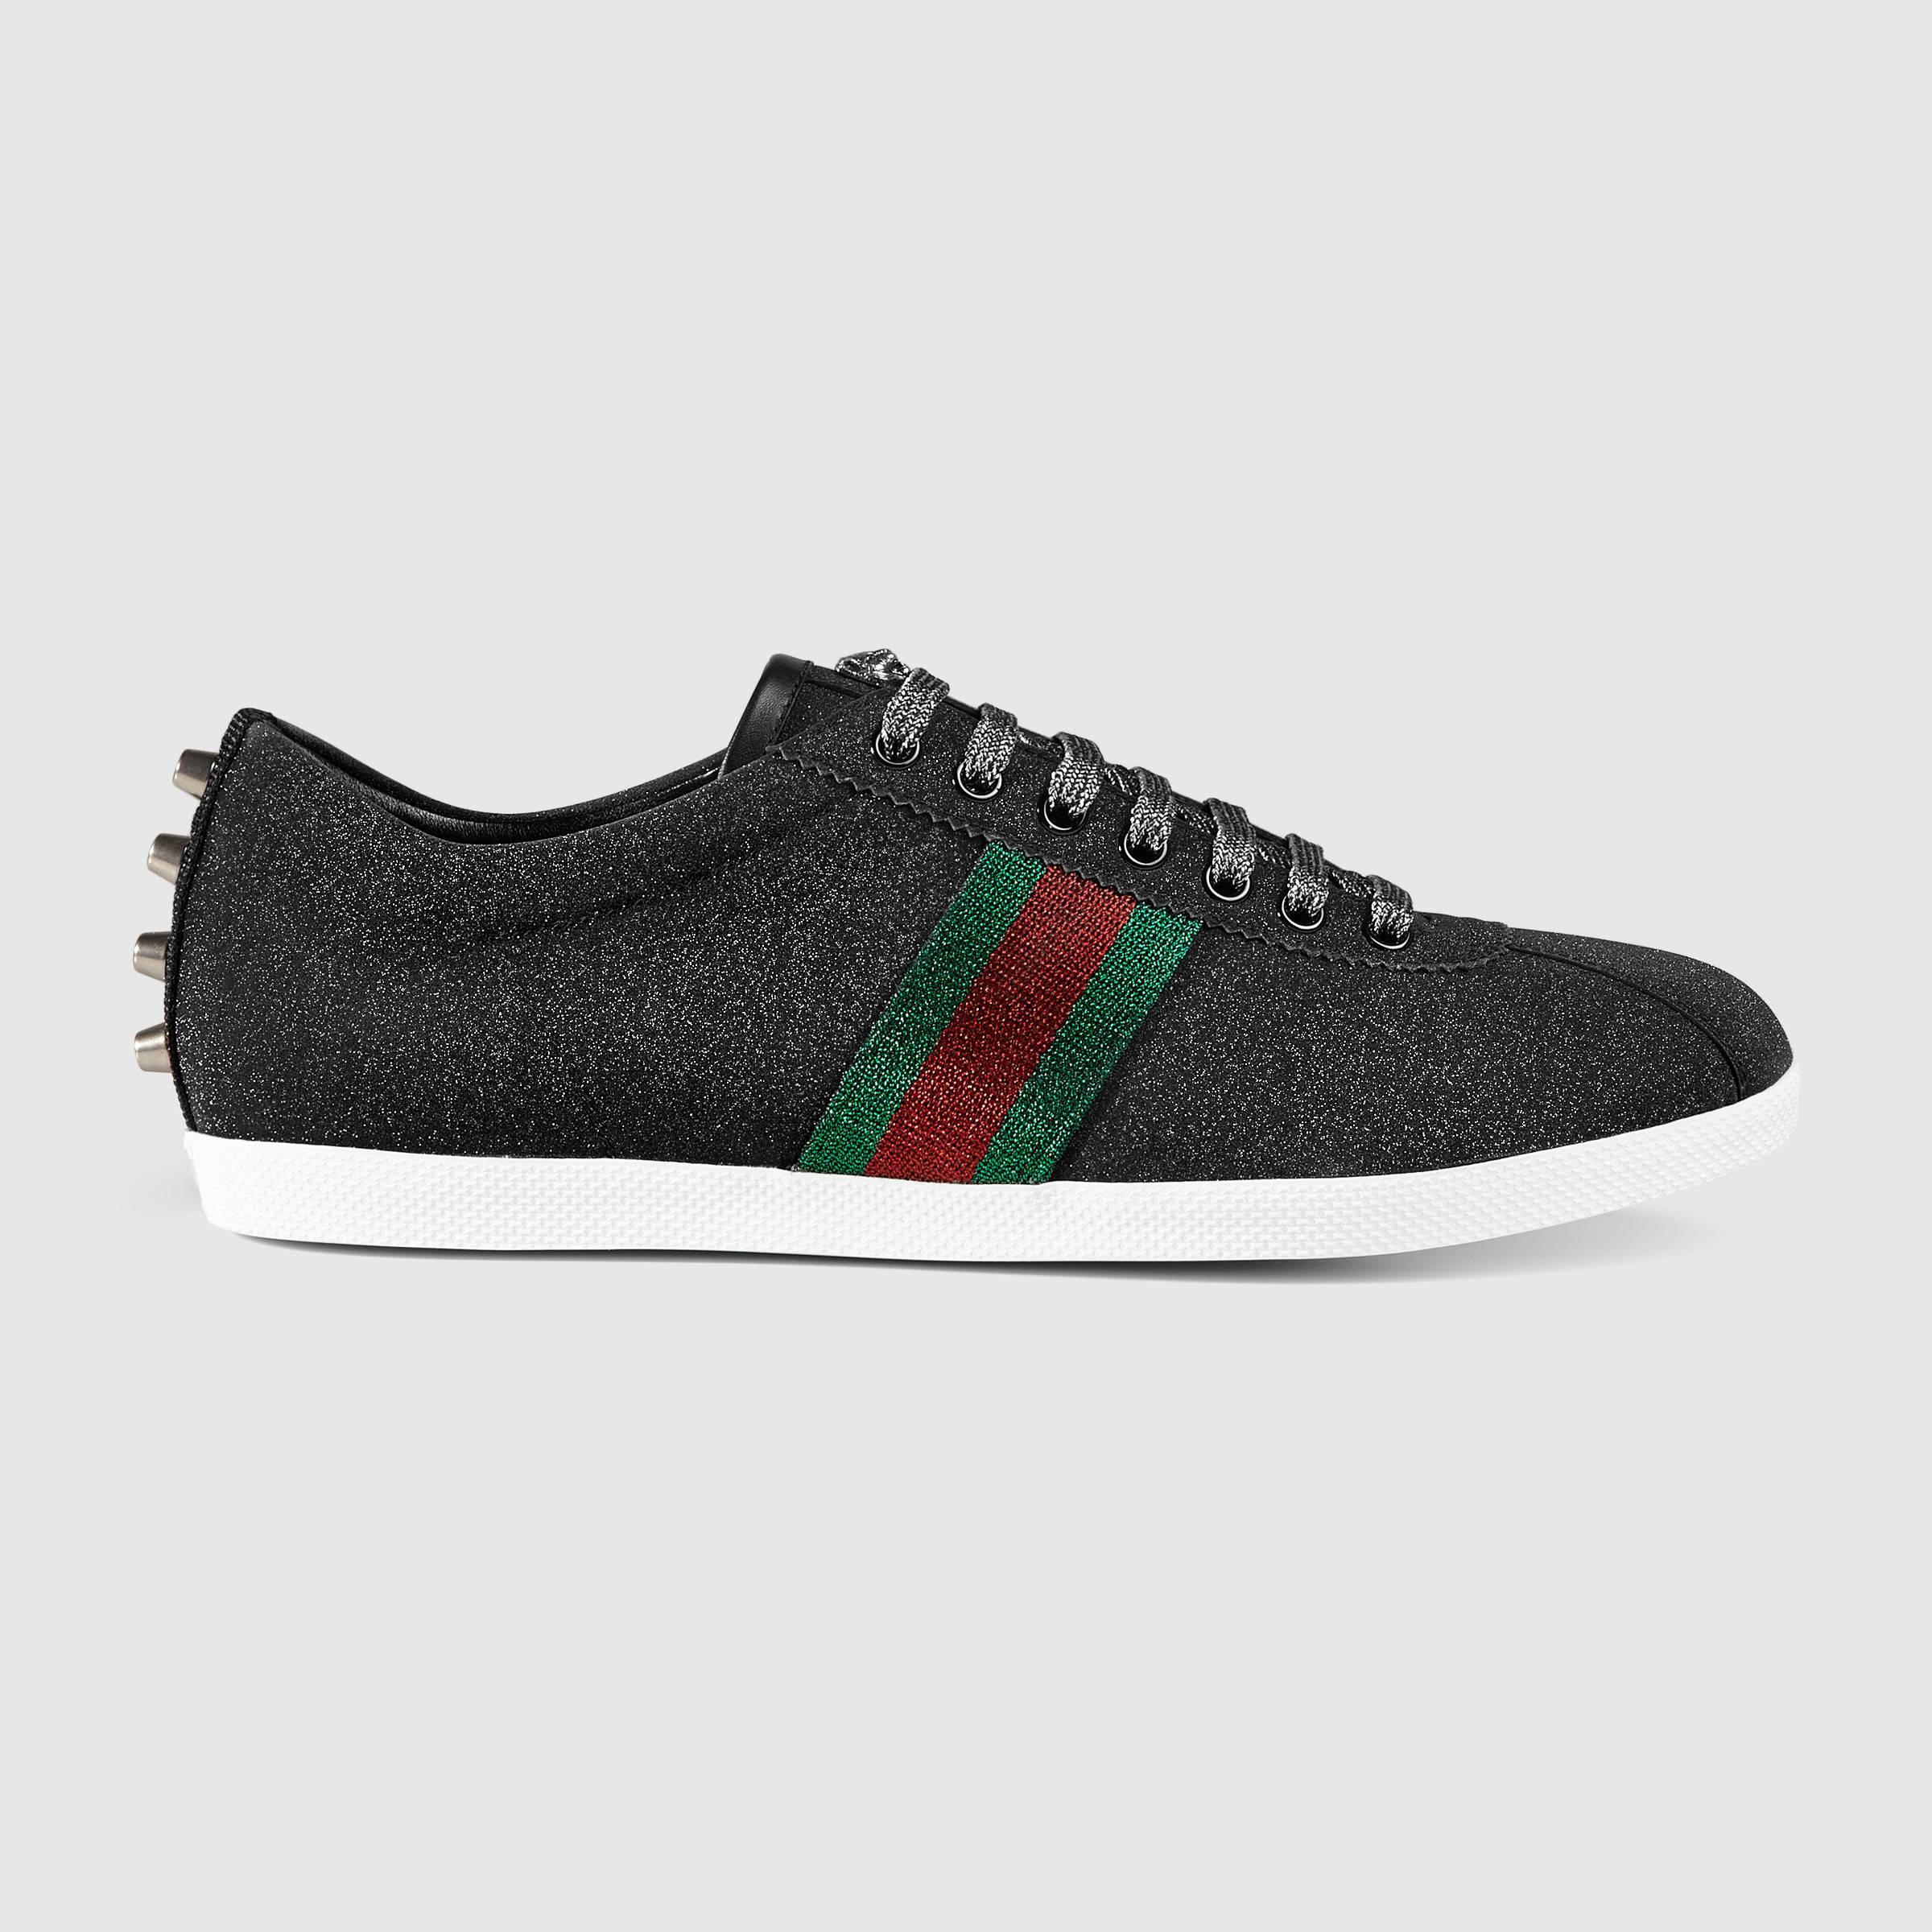 05e9afde684c Lyst - Gucci Glitter Web Sneaker in Black for Men